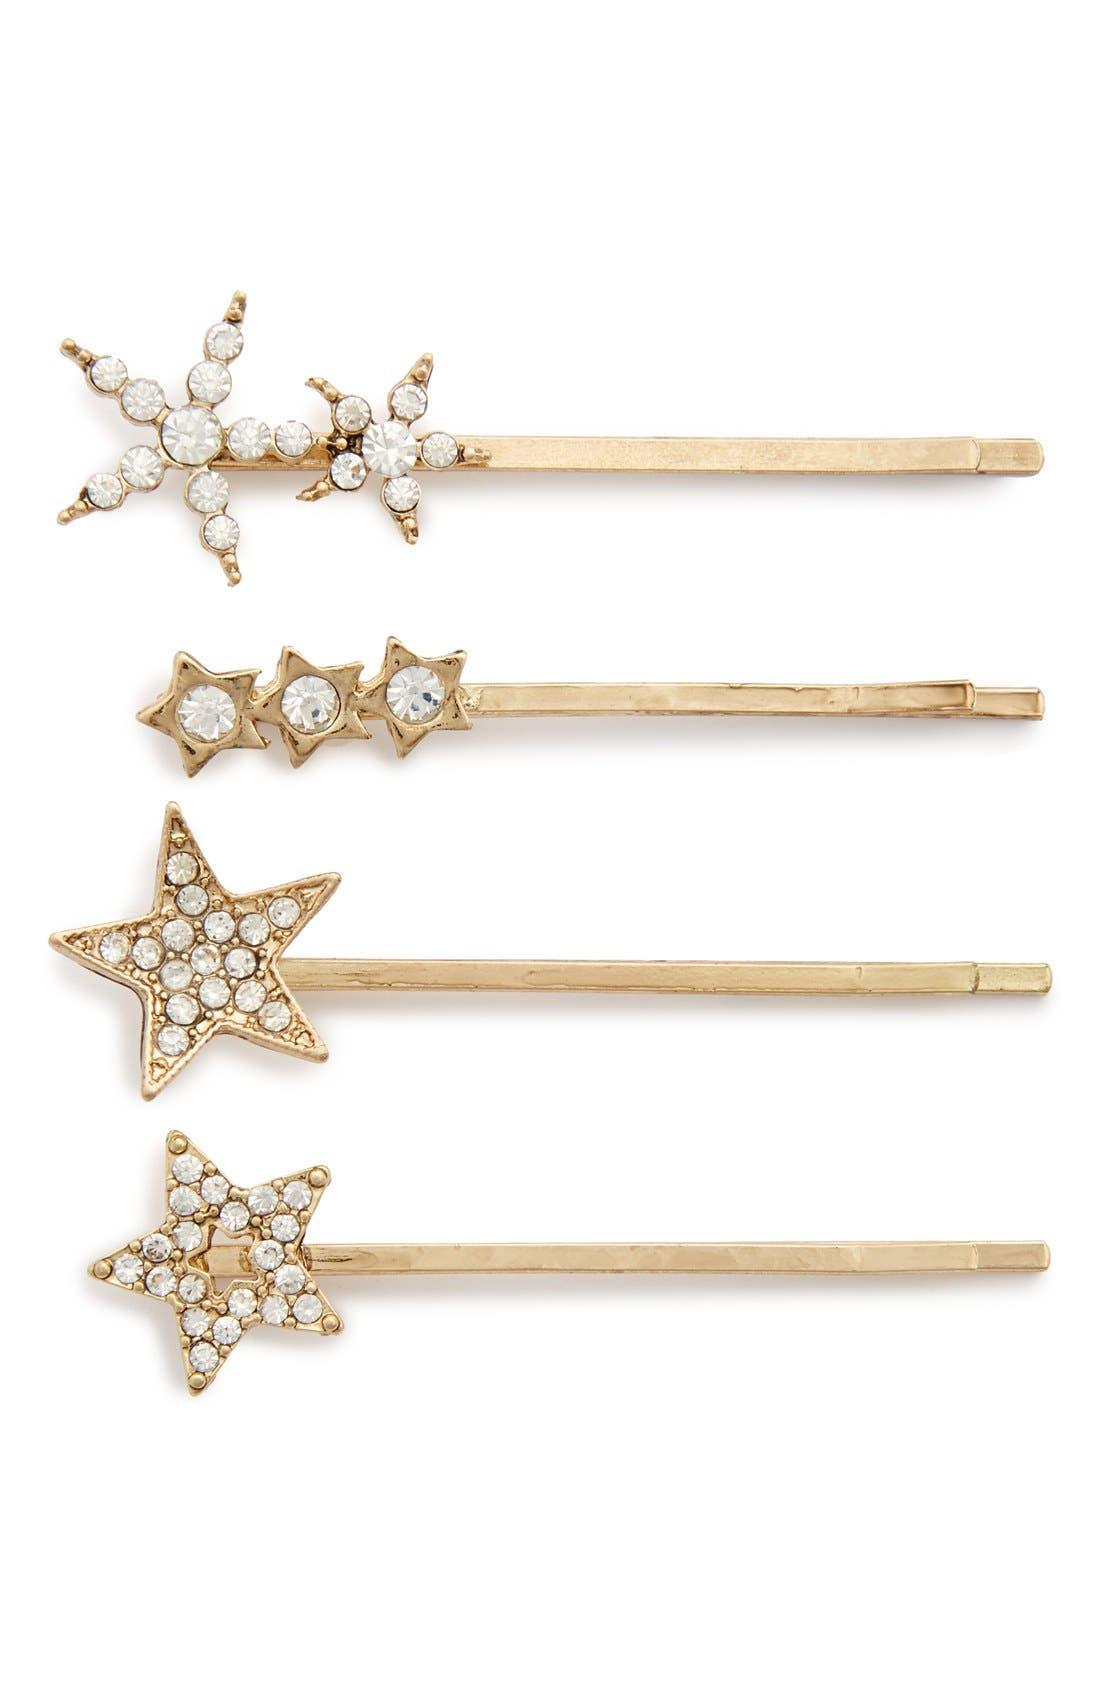 Alternate Image 1 Selected - Tasha 'Crystal Stars' Bobby Pins (Set of 4)